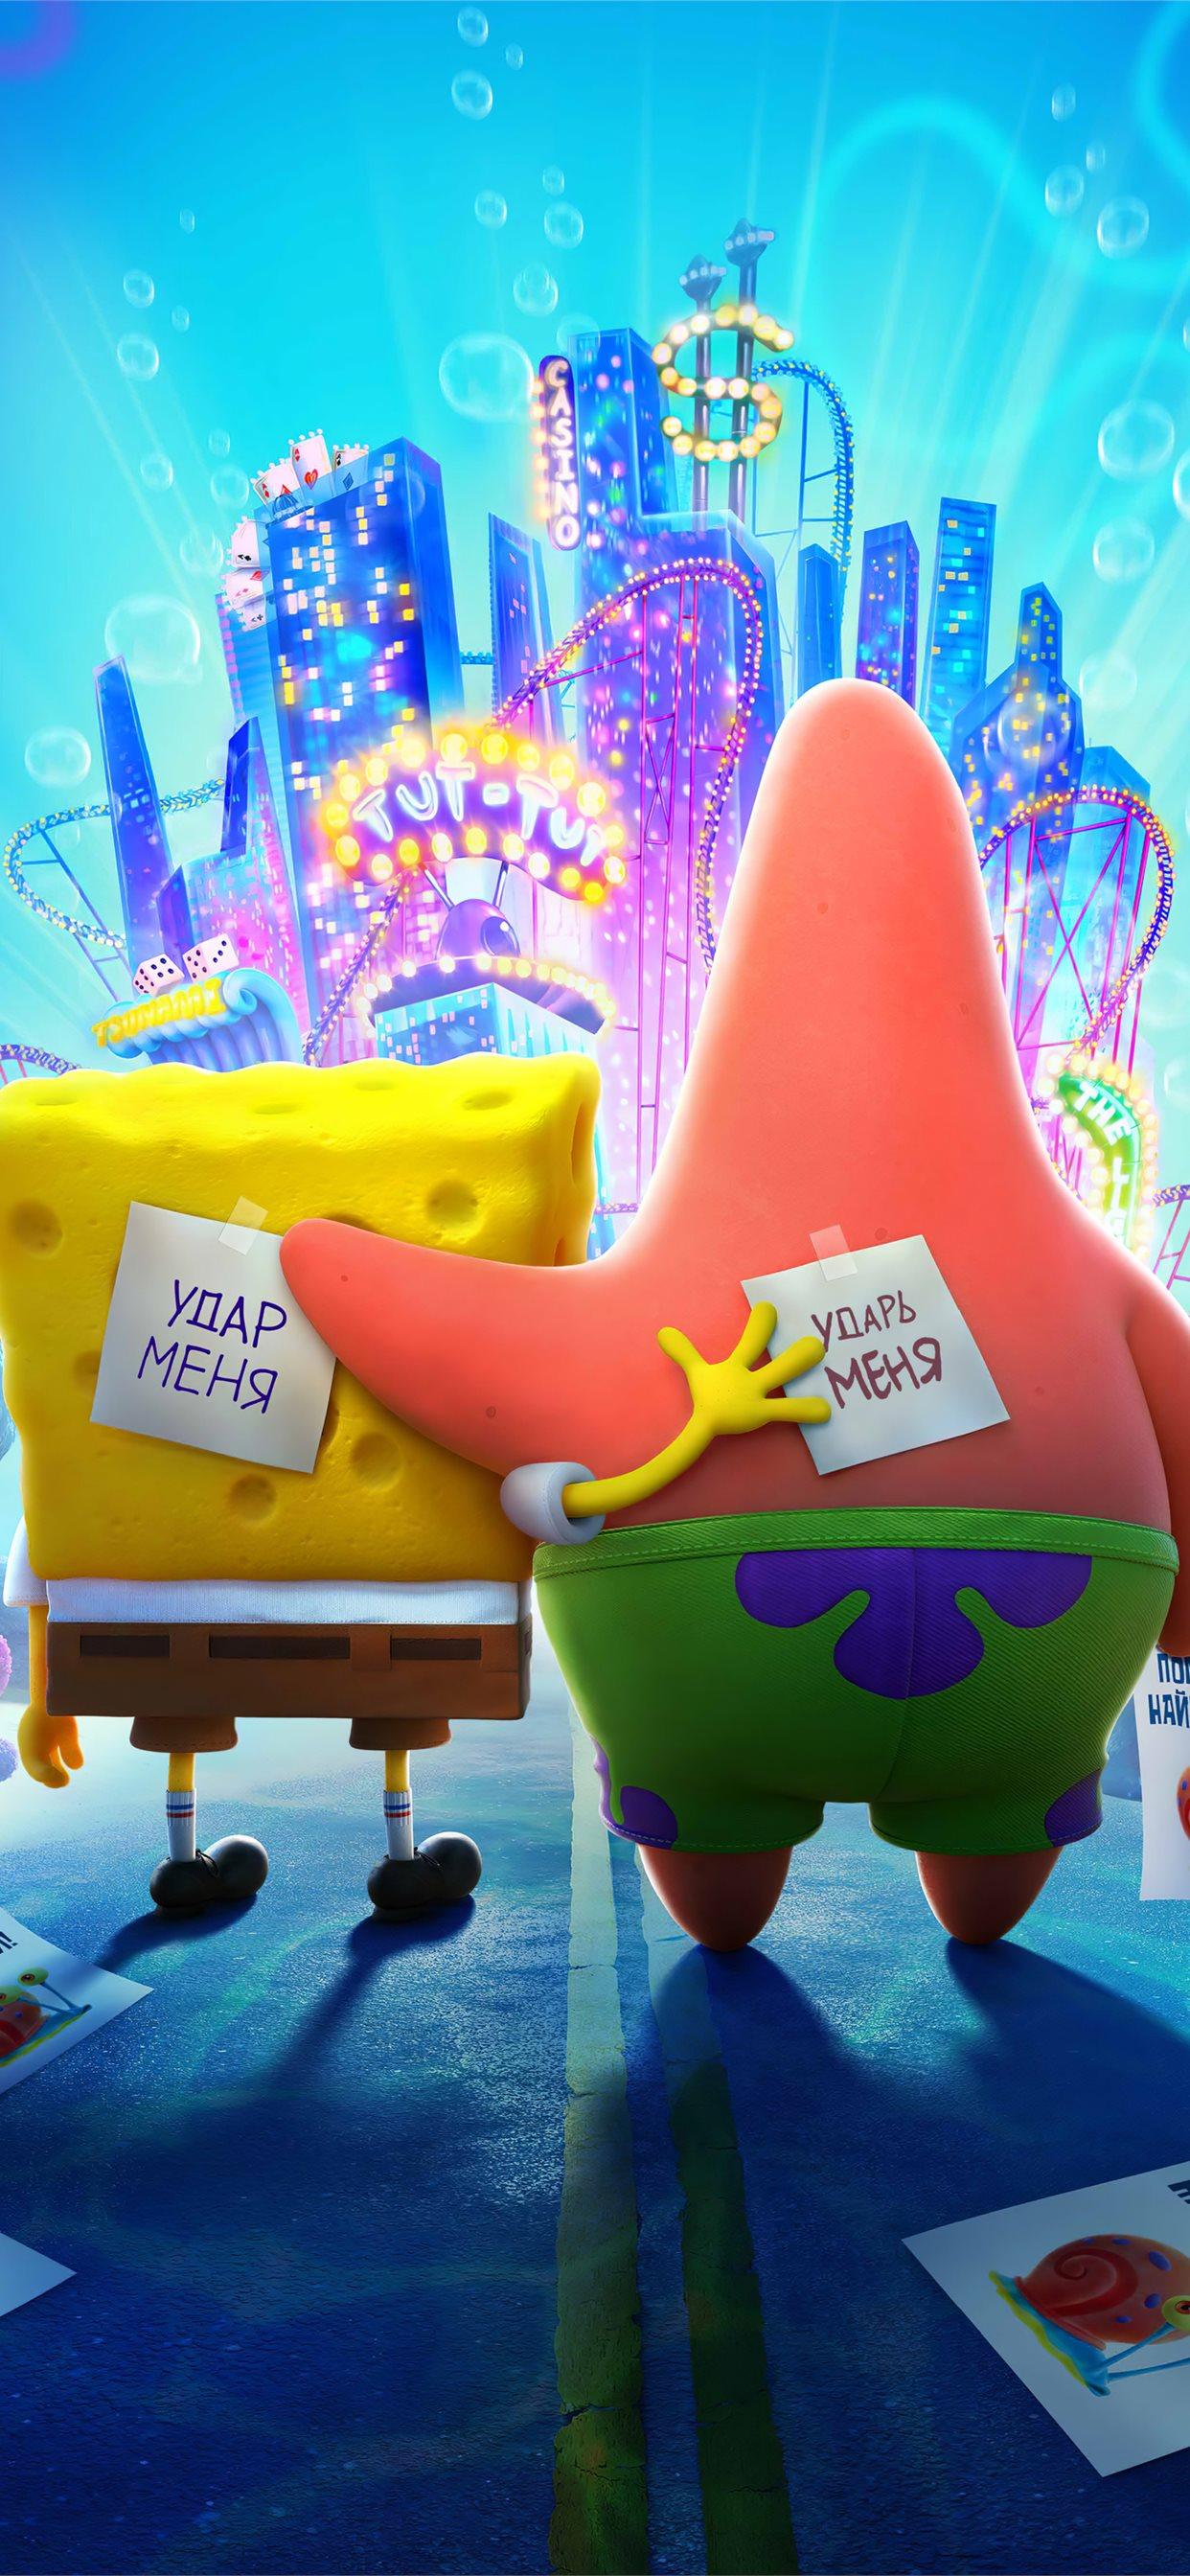 the spongebob movie sponge on the run iphone xs max wallpaper